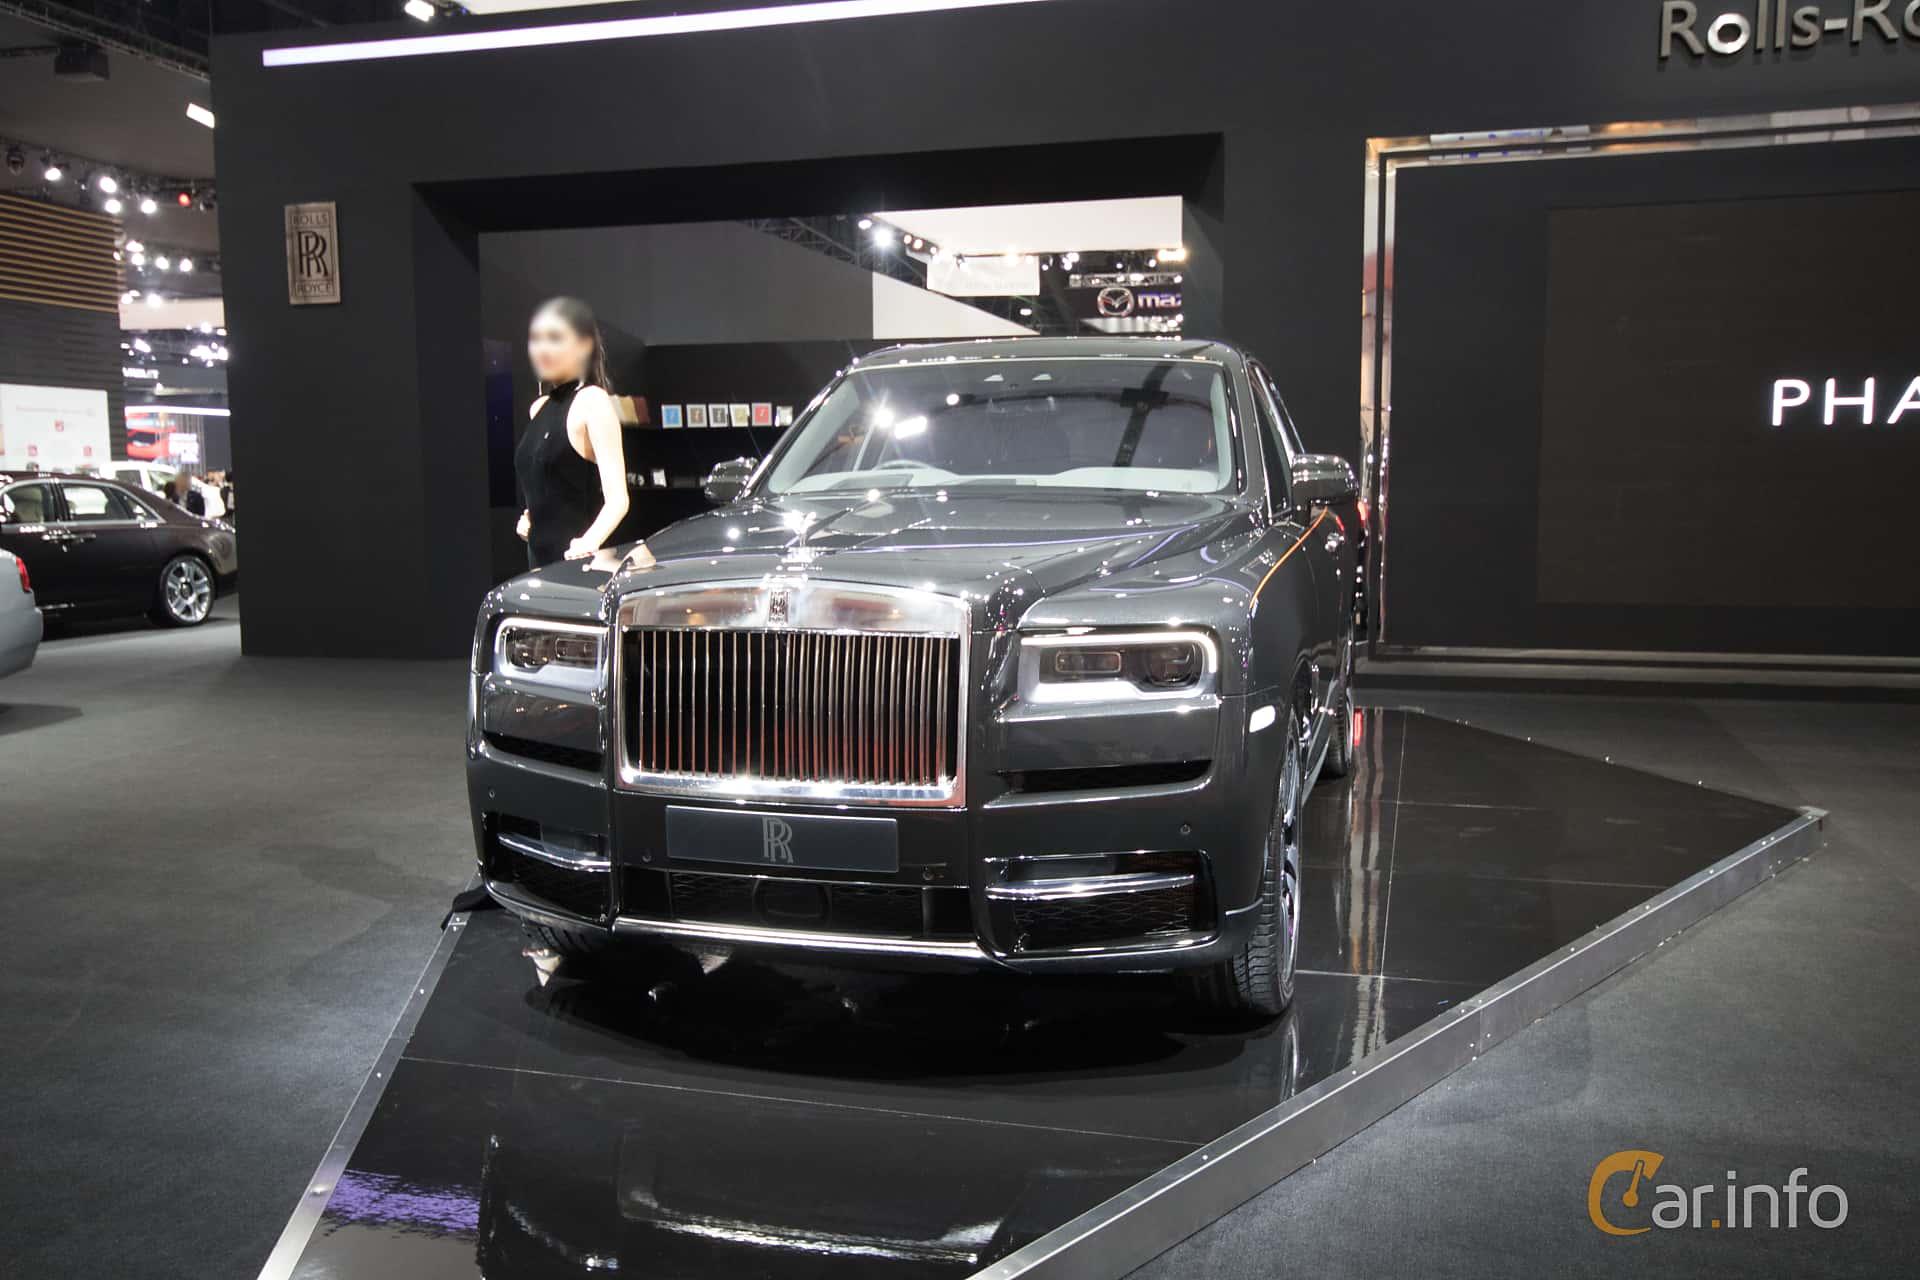 Front/Side  of Rolls-Royce Cullinan 6.75 V12 Automatic, 571ps, 2019 at Bangkok Motor Show 2019